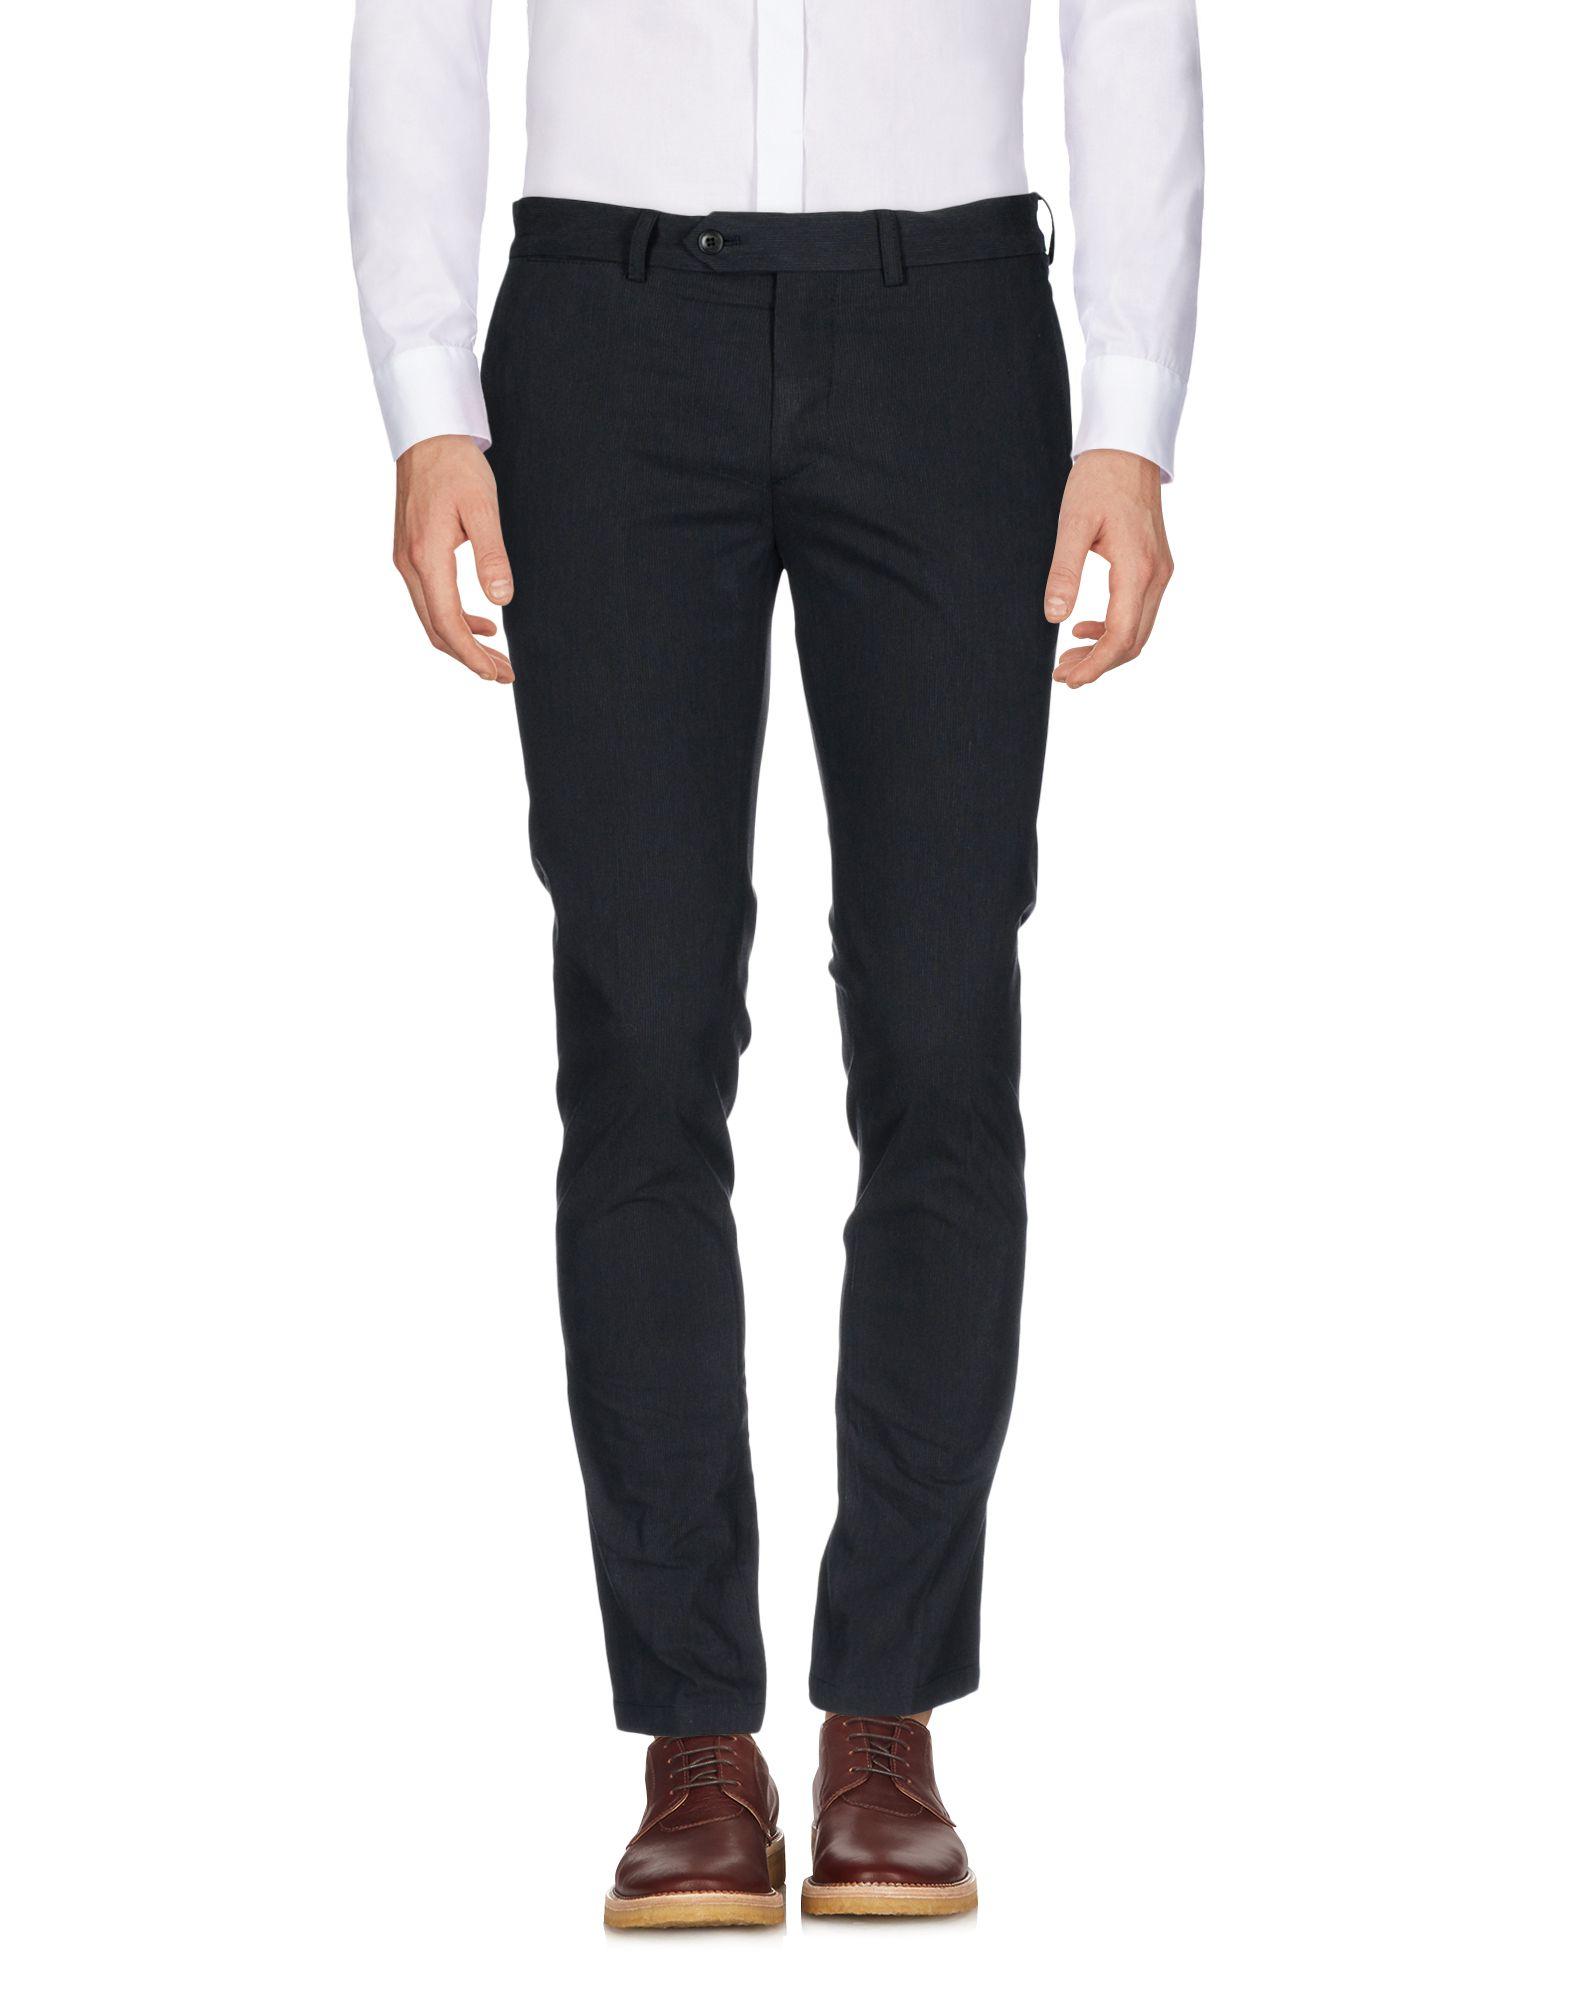 A Pantalone buon mercato Pantalone A Yoon Uomo - 13133126SU a17dc1